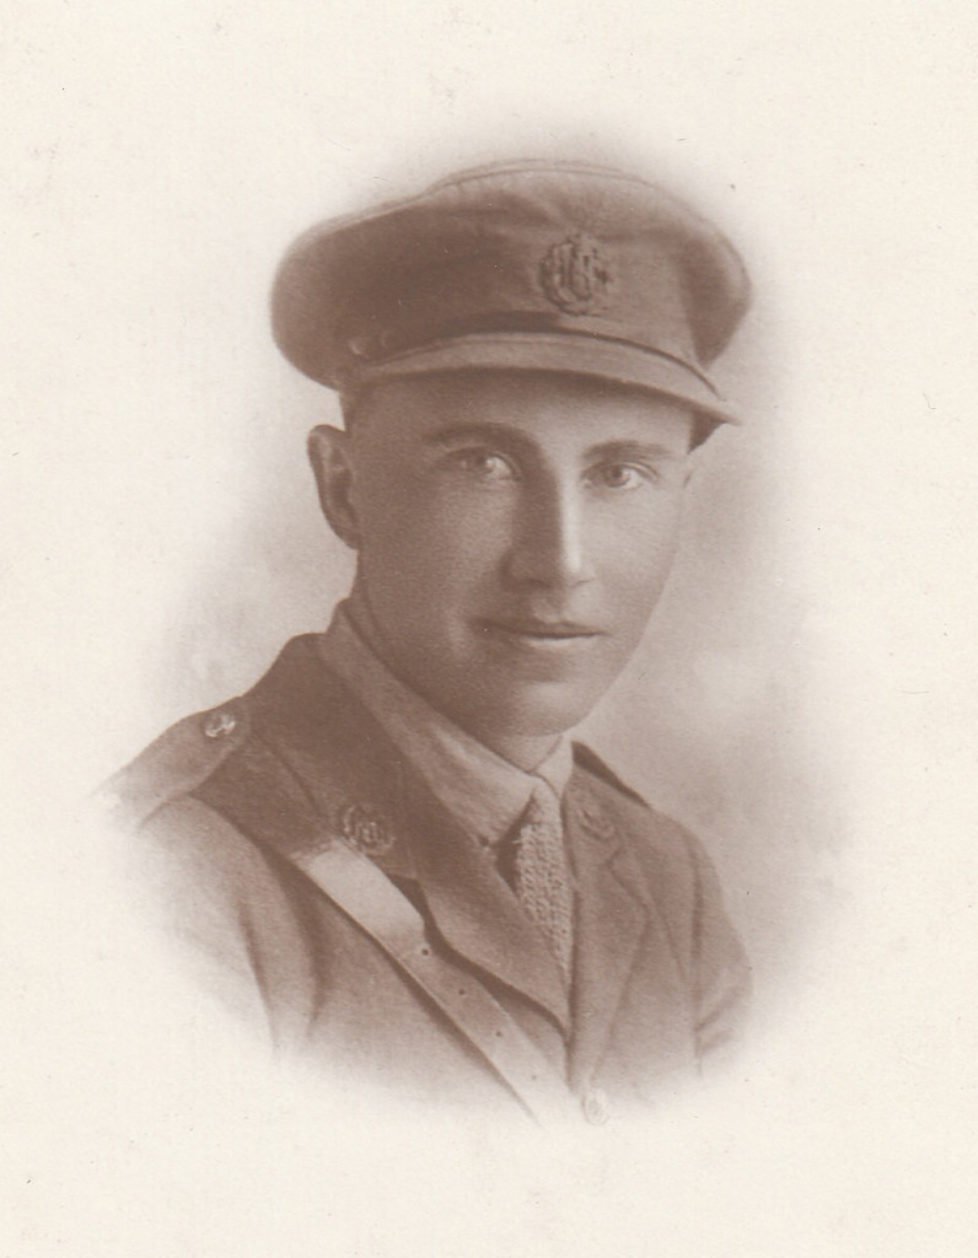 Lt. Nathaniel George Dobson